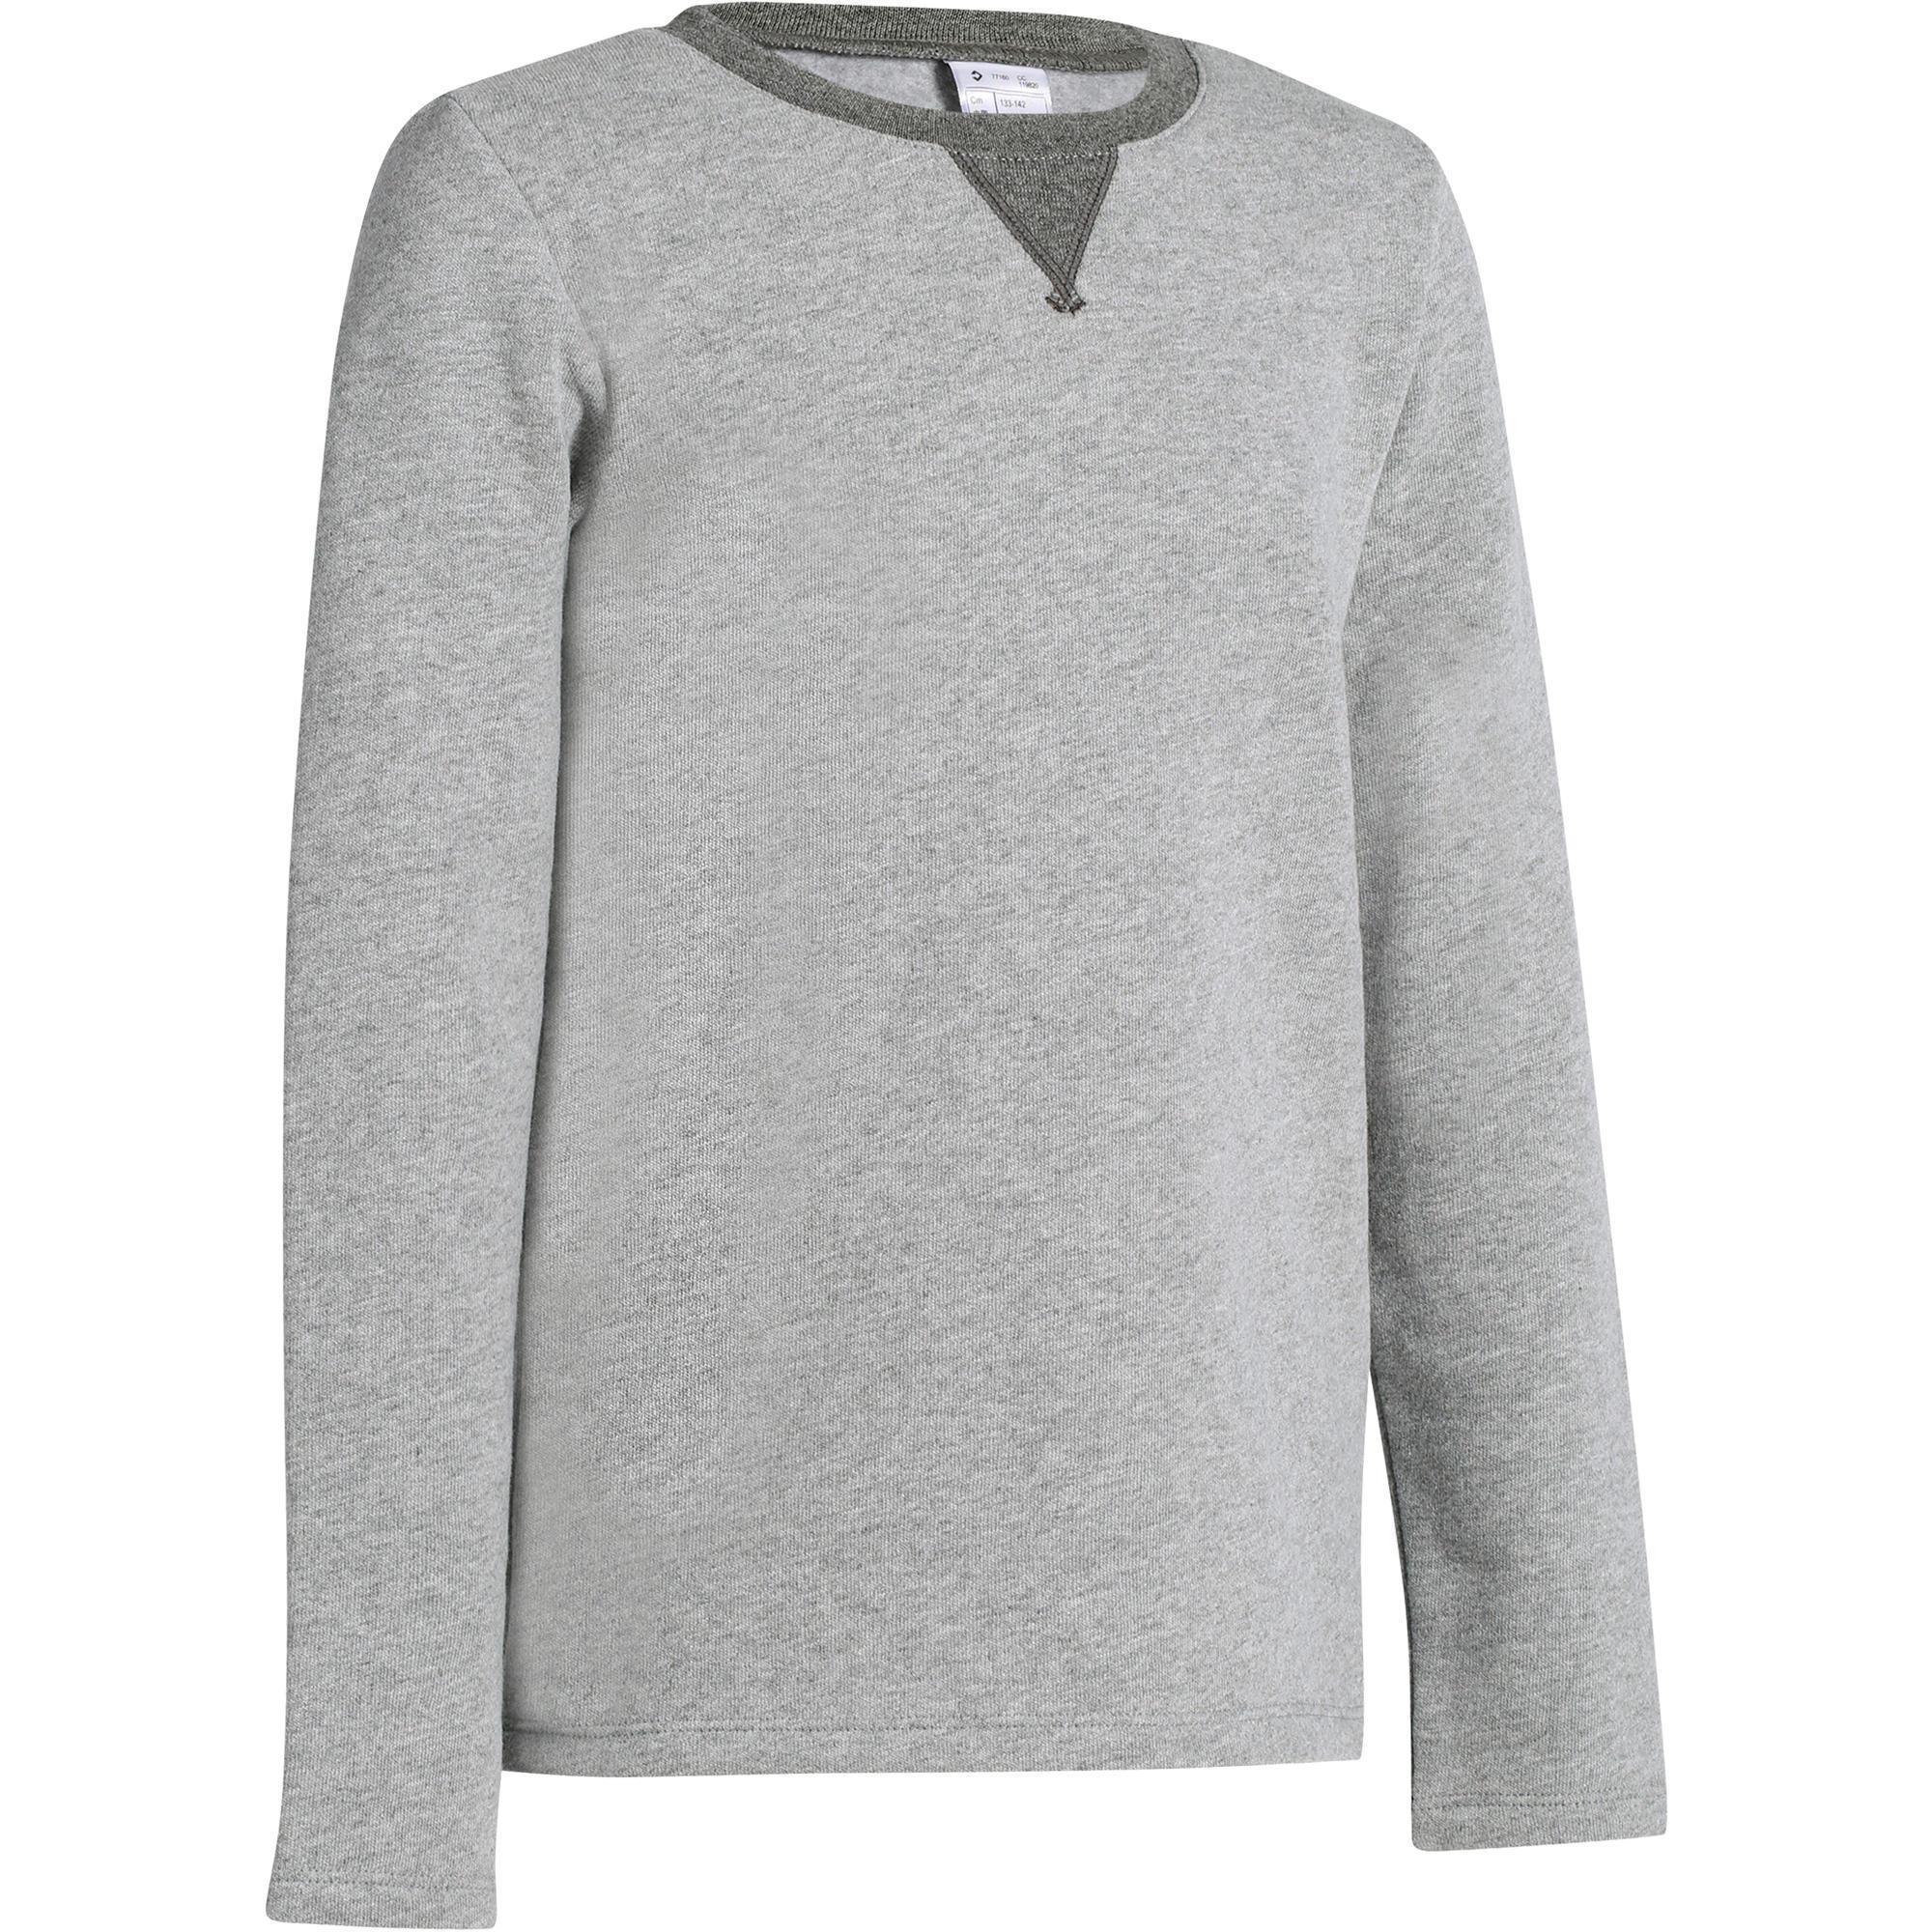 Domyos Gymsweater 100 jongens